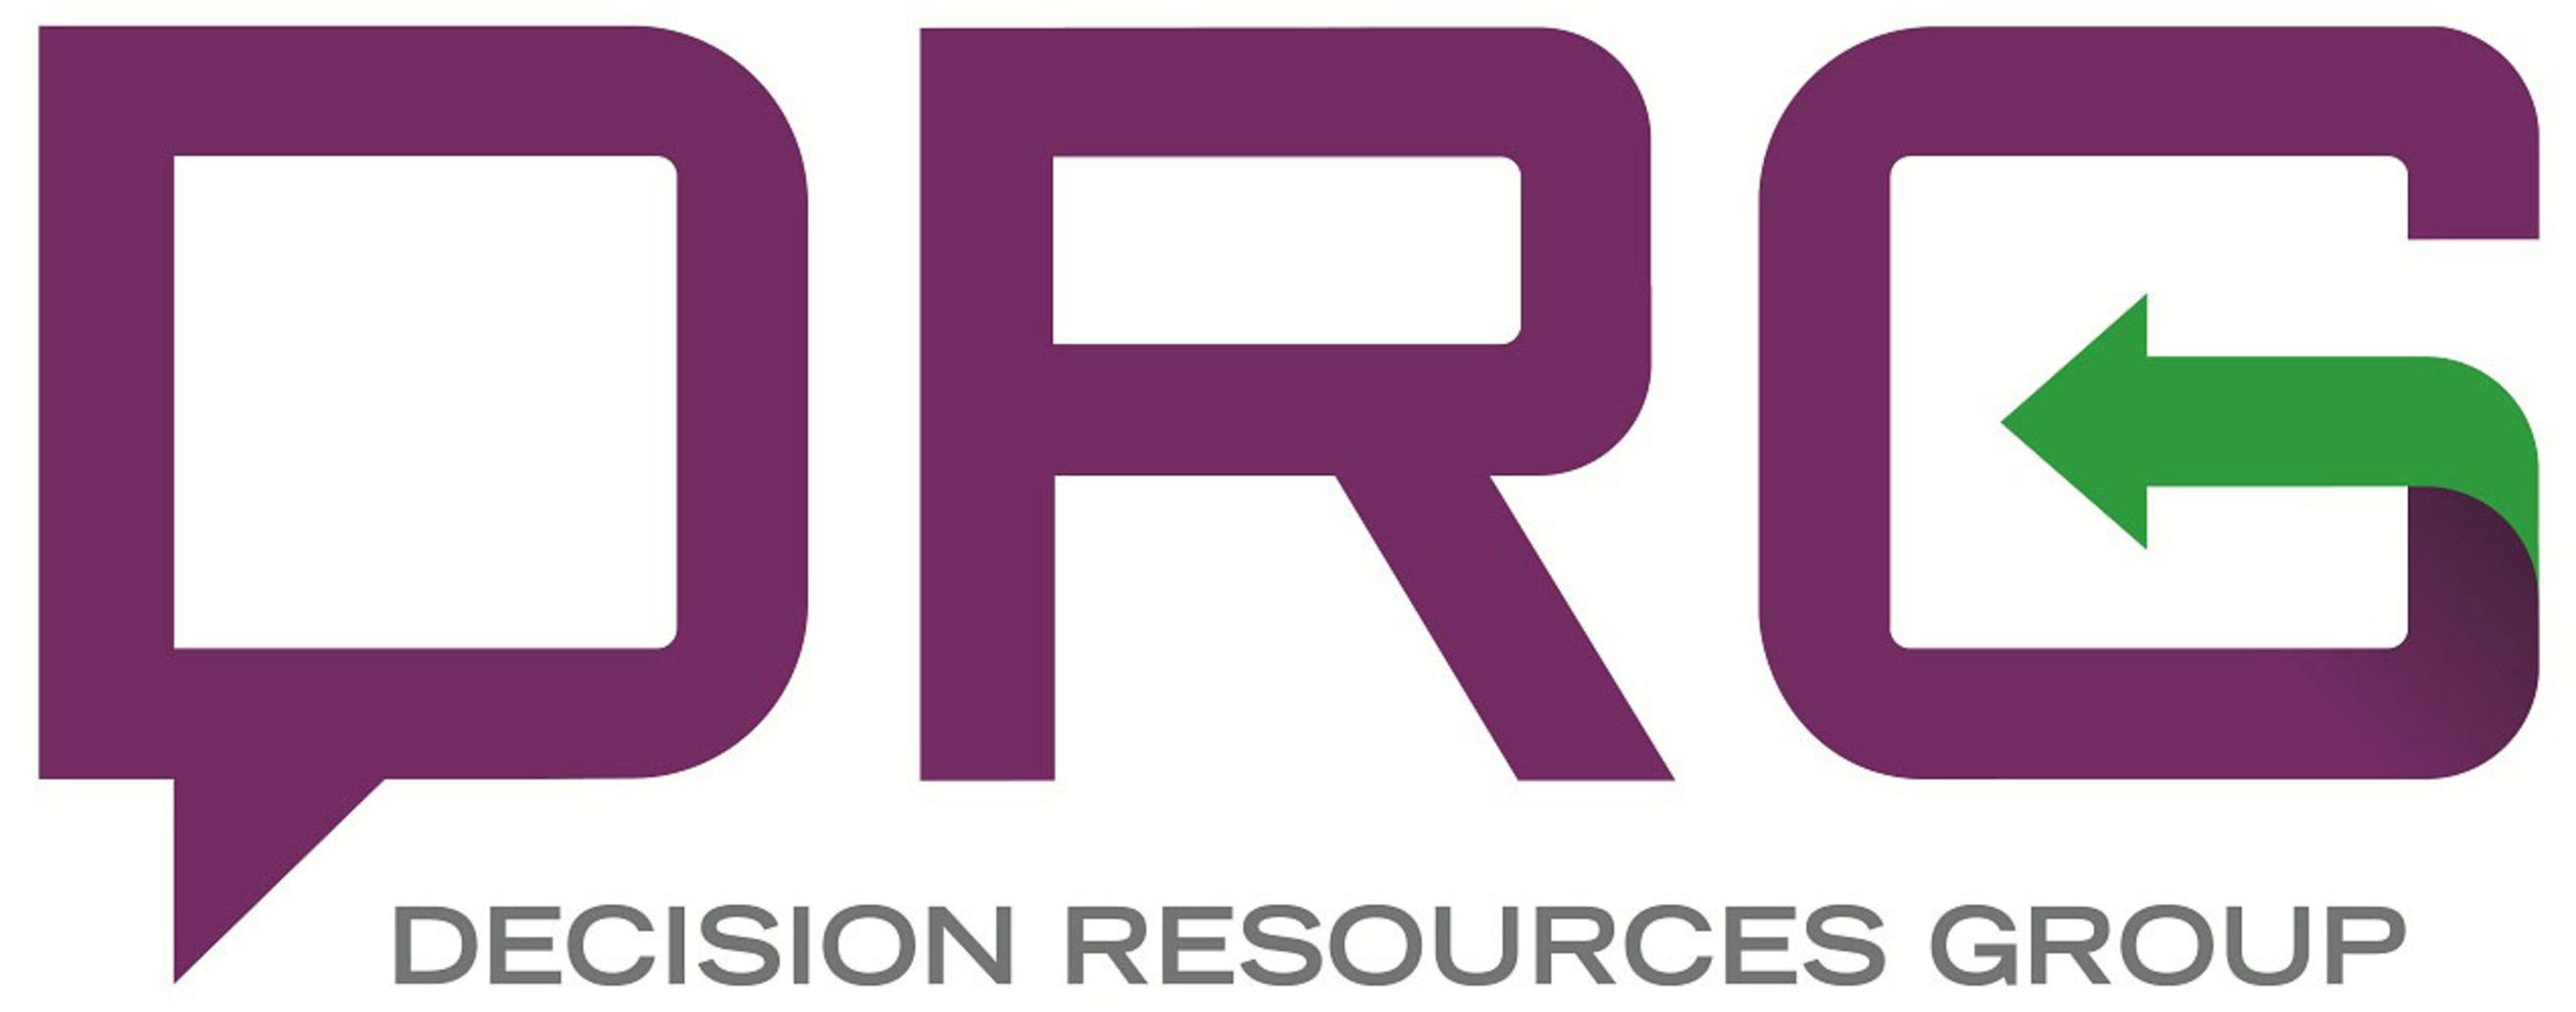 Decision Resources Group Logo.